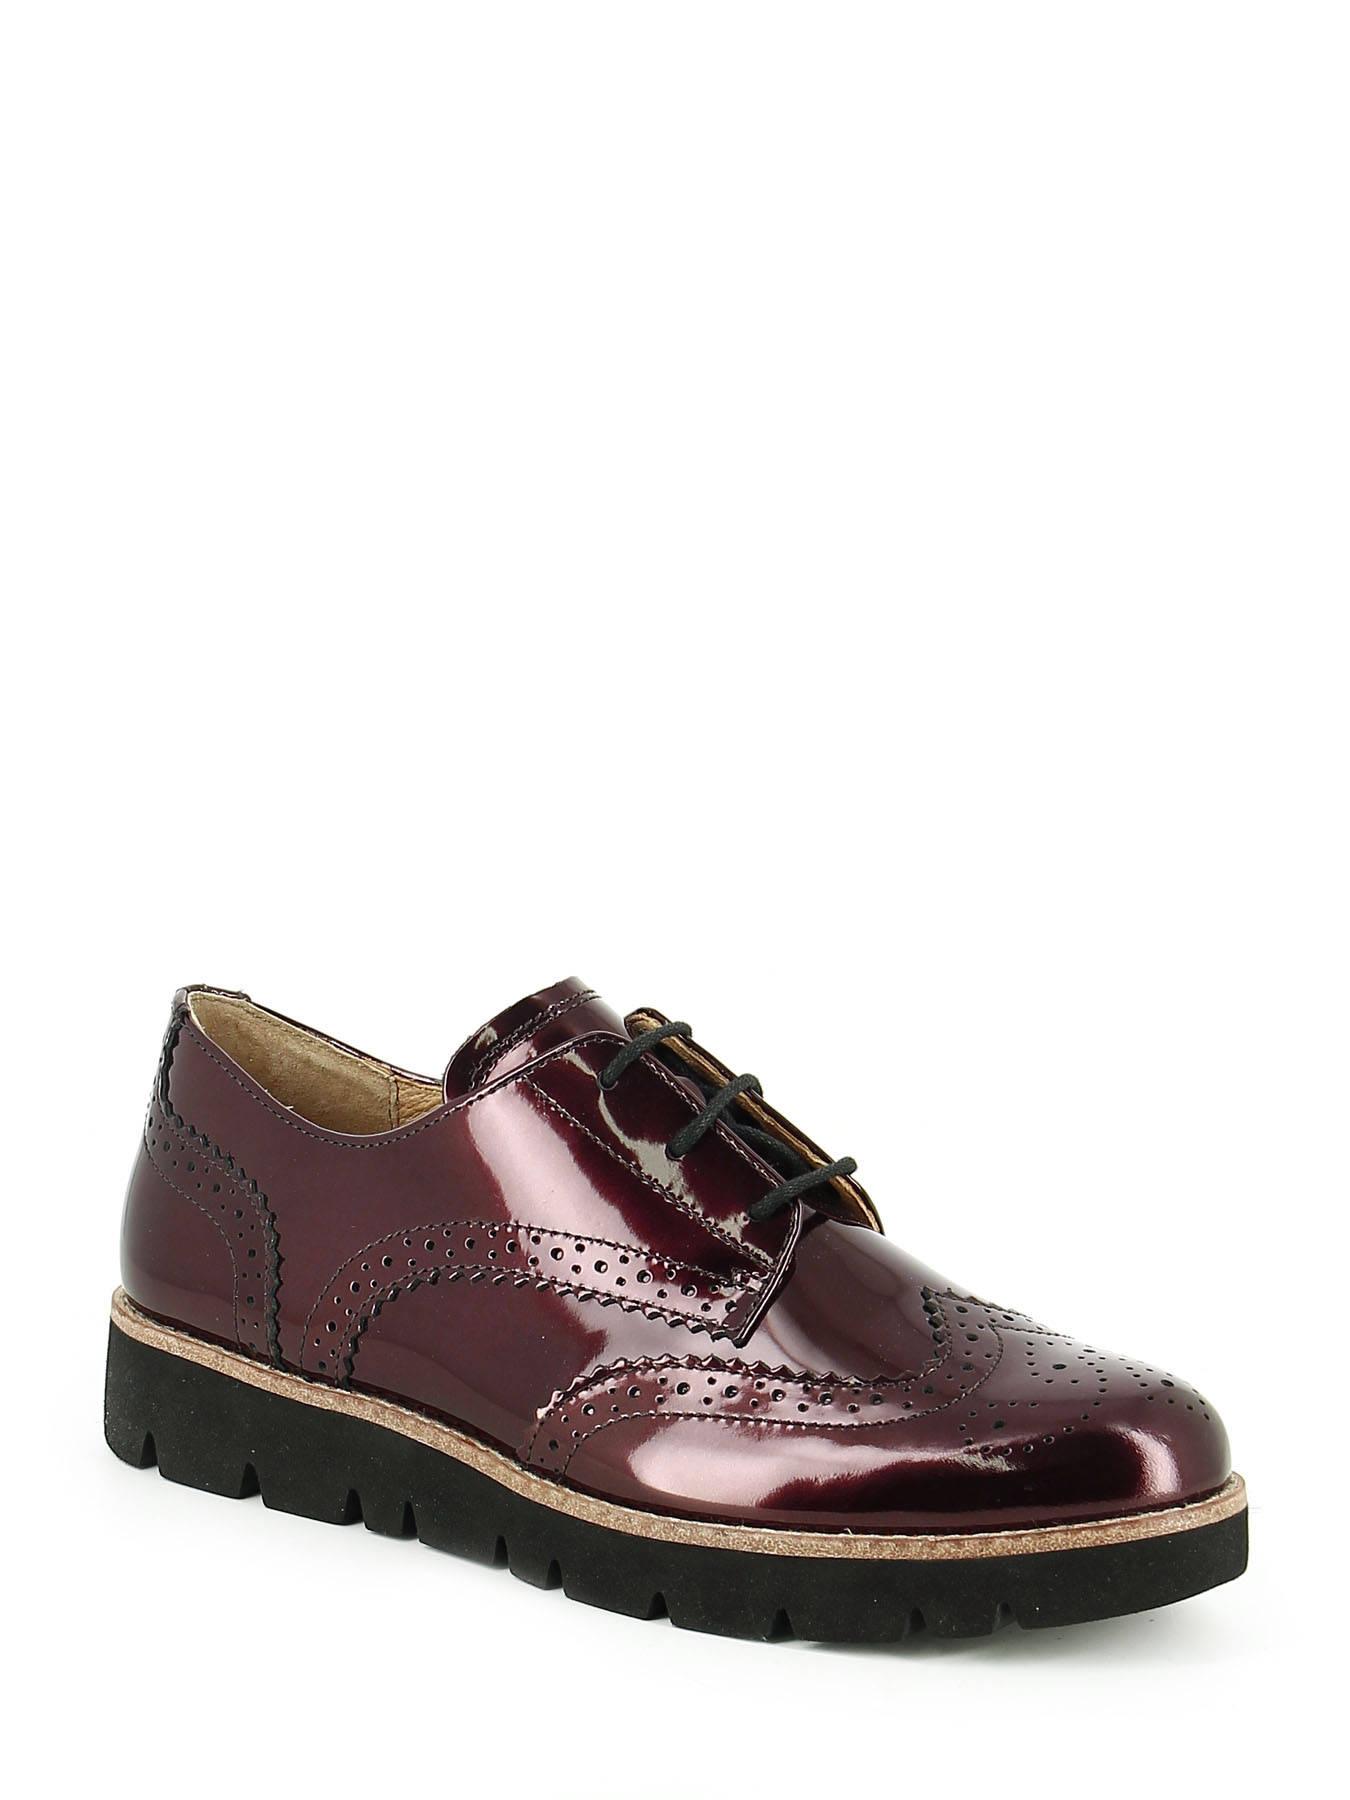 online store 08e68 847a5 Lace-up shoes GABOR